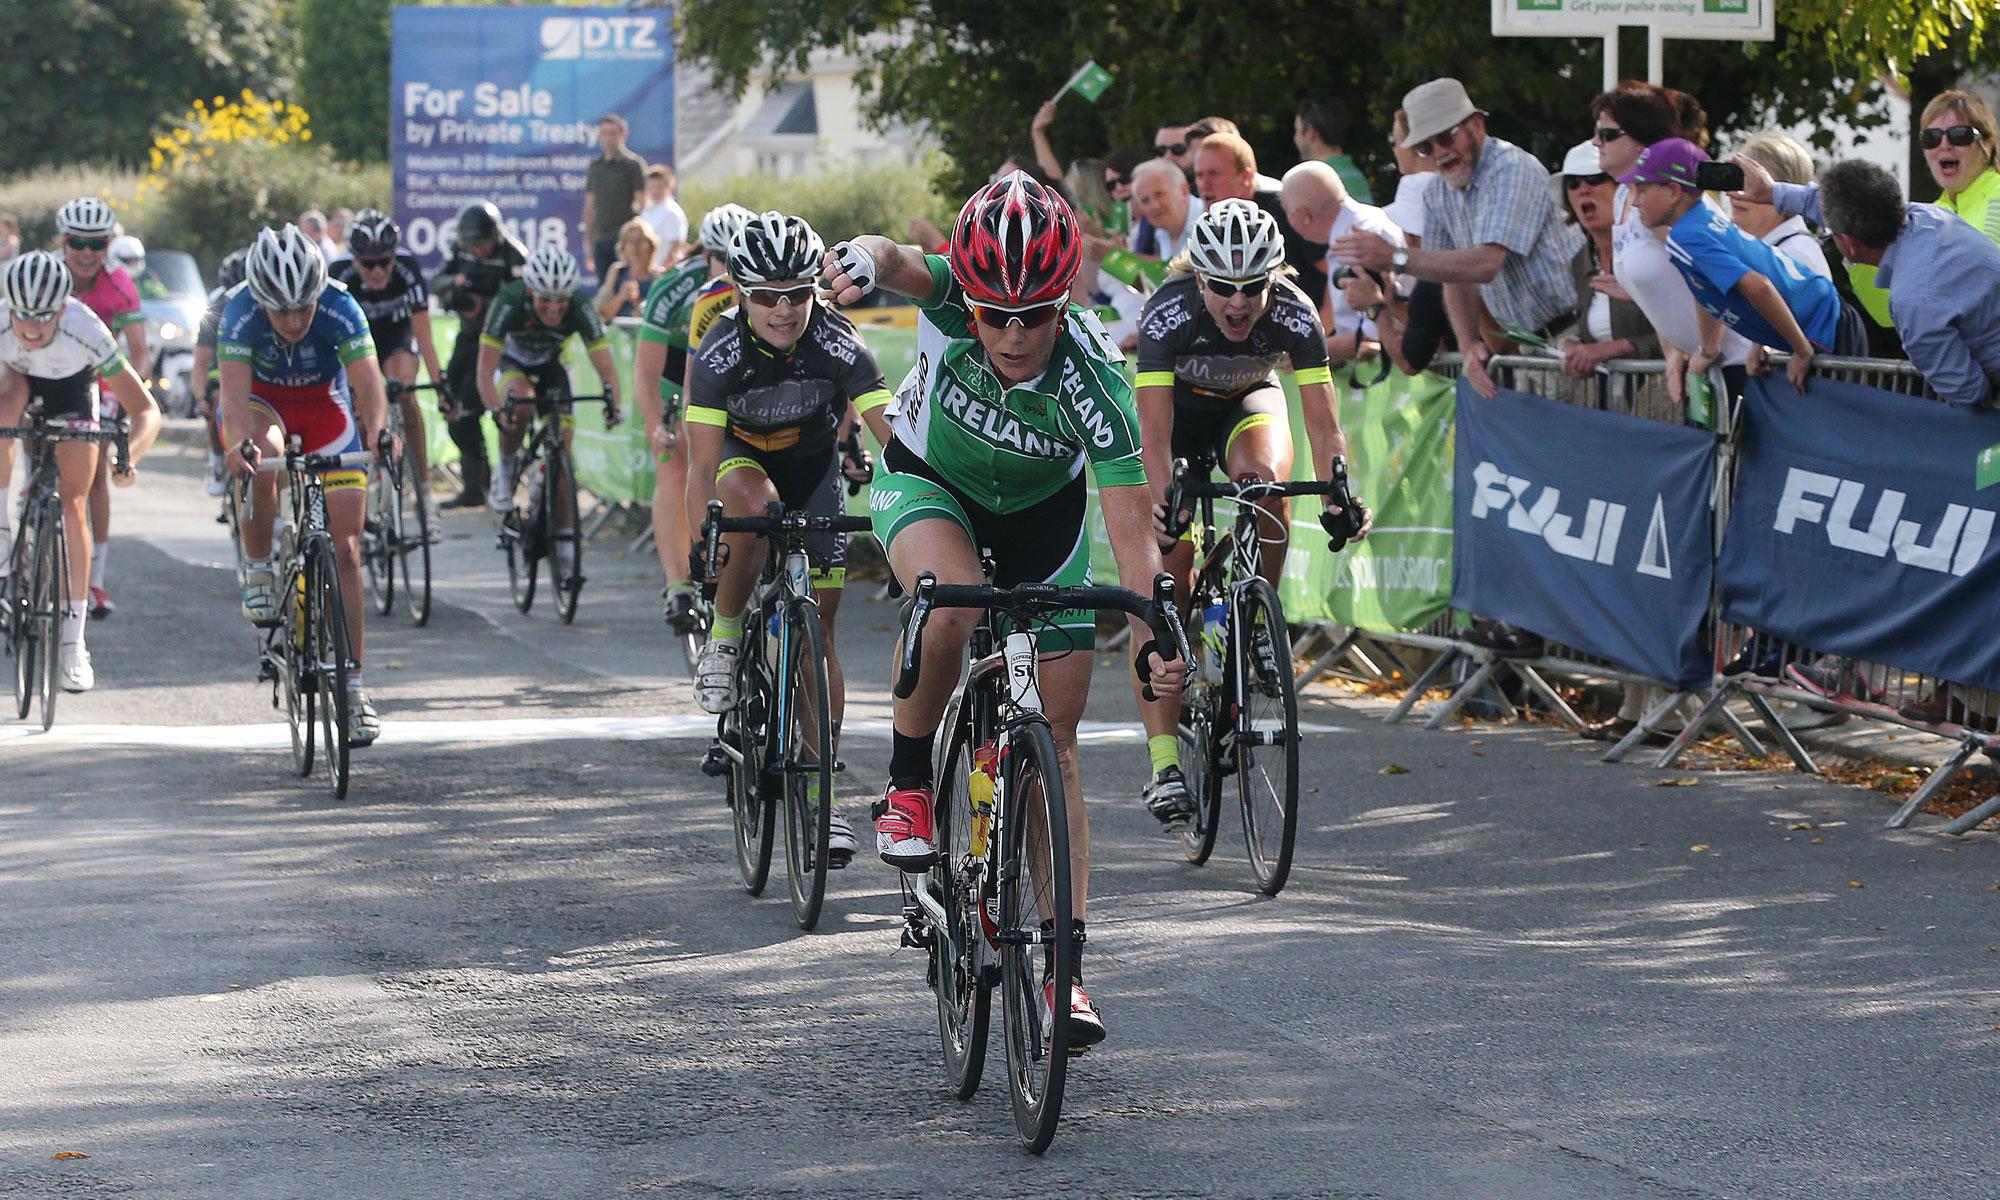 2014 Rás na mBan Stage 4 finish - Olivia Dillon